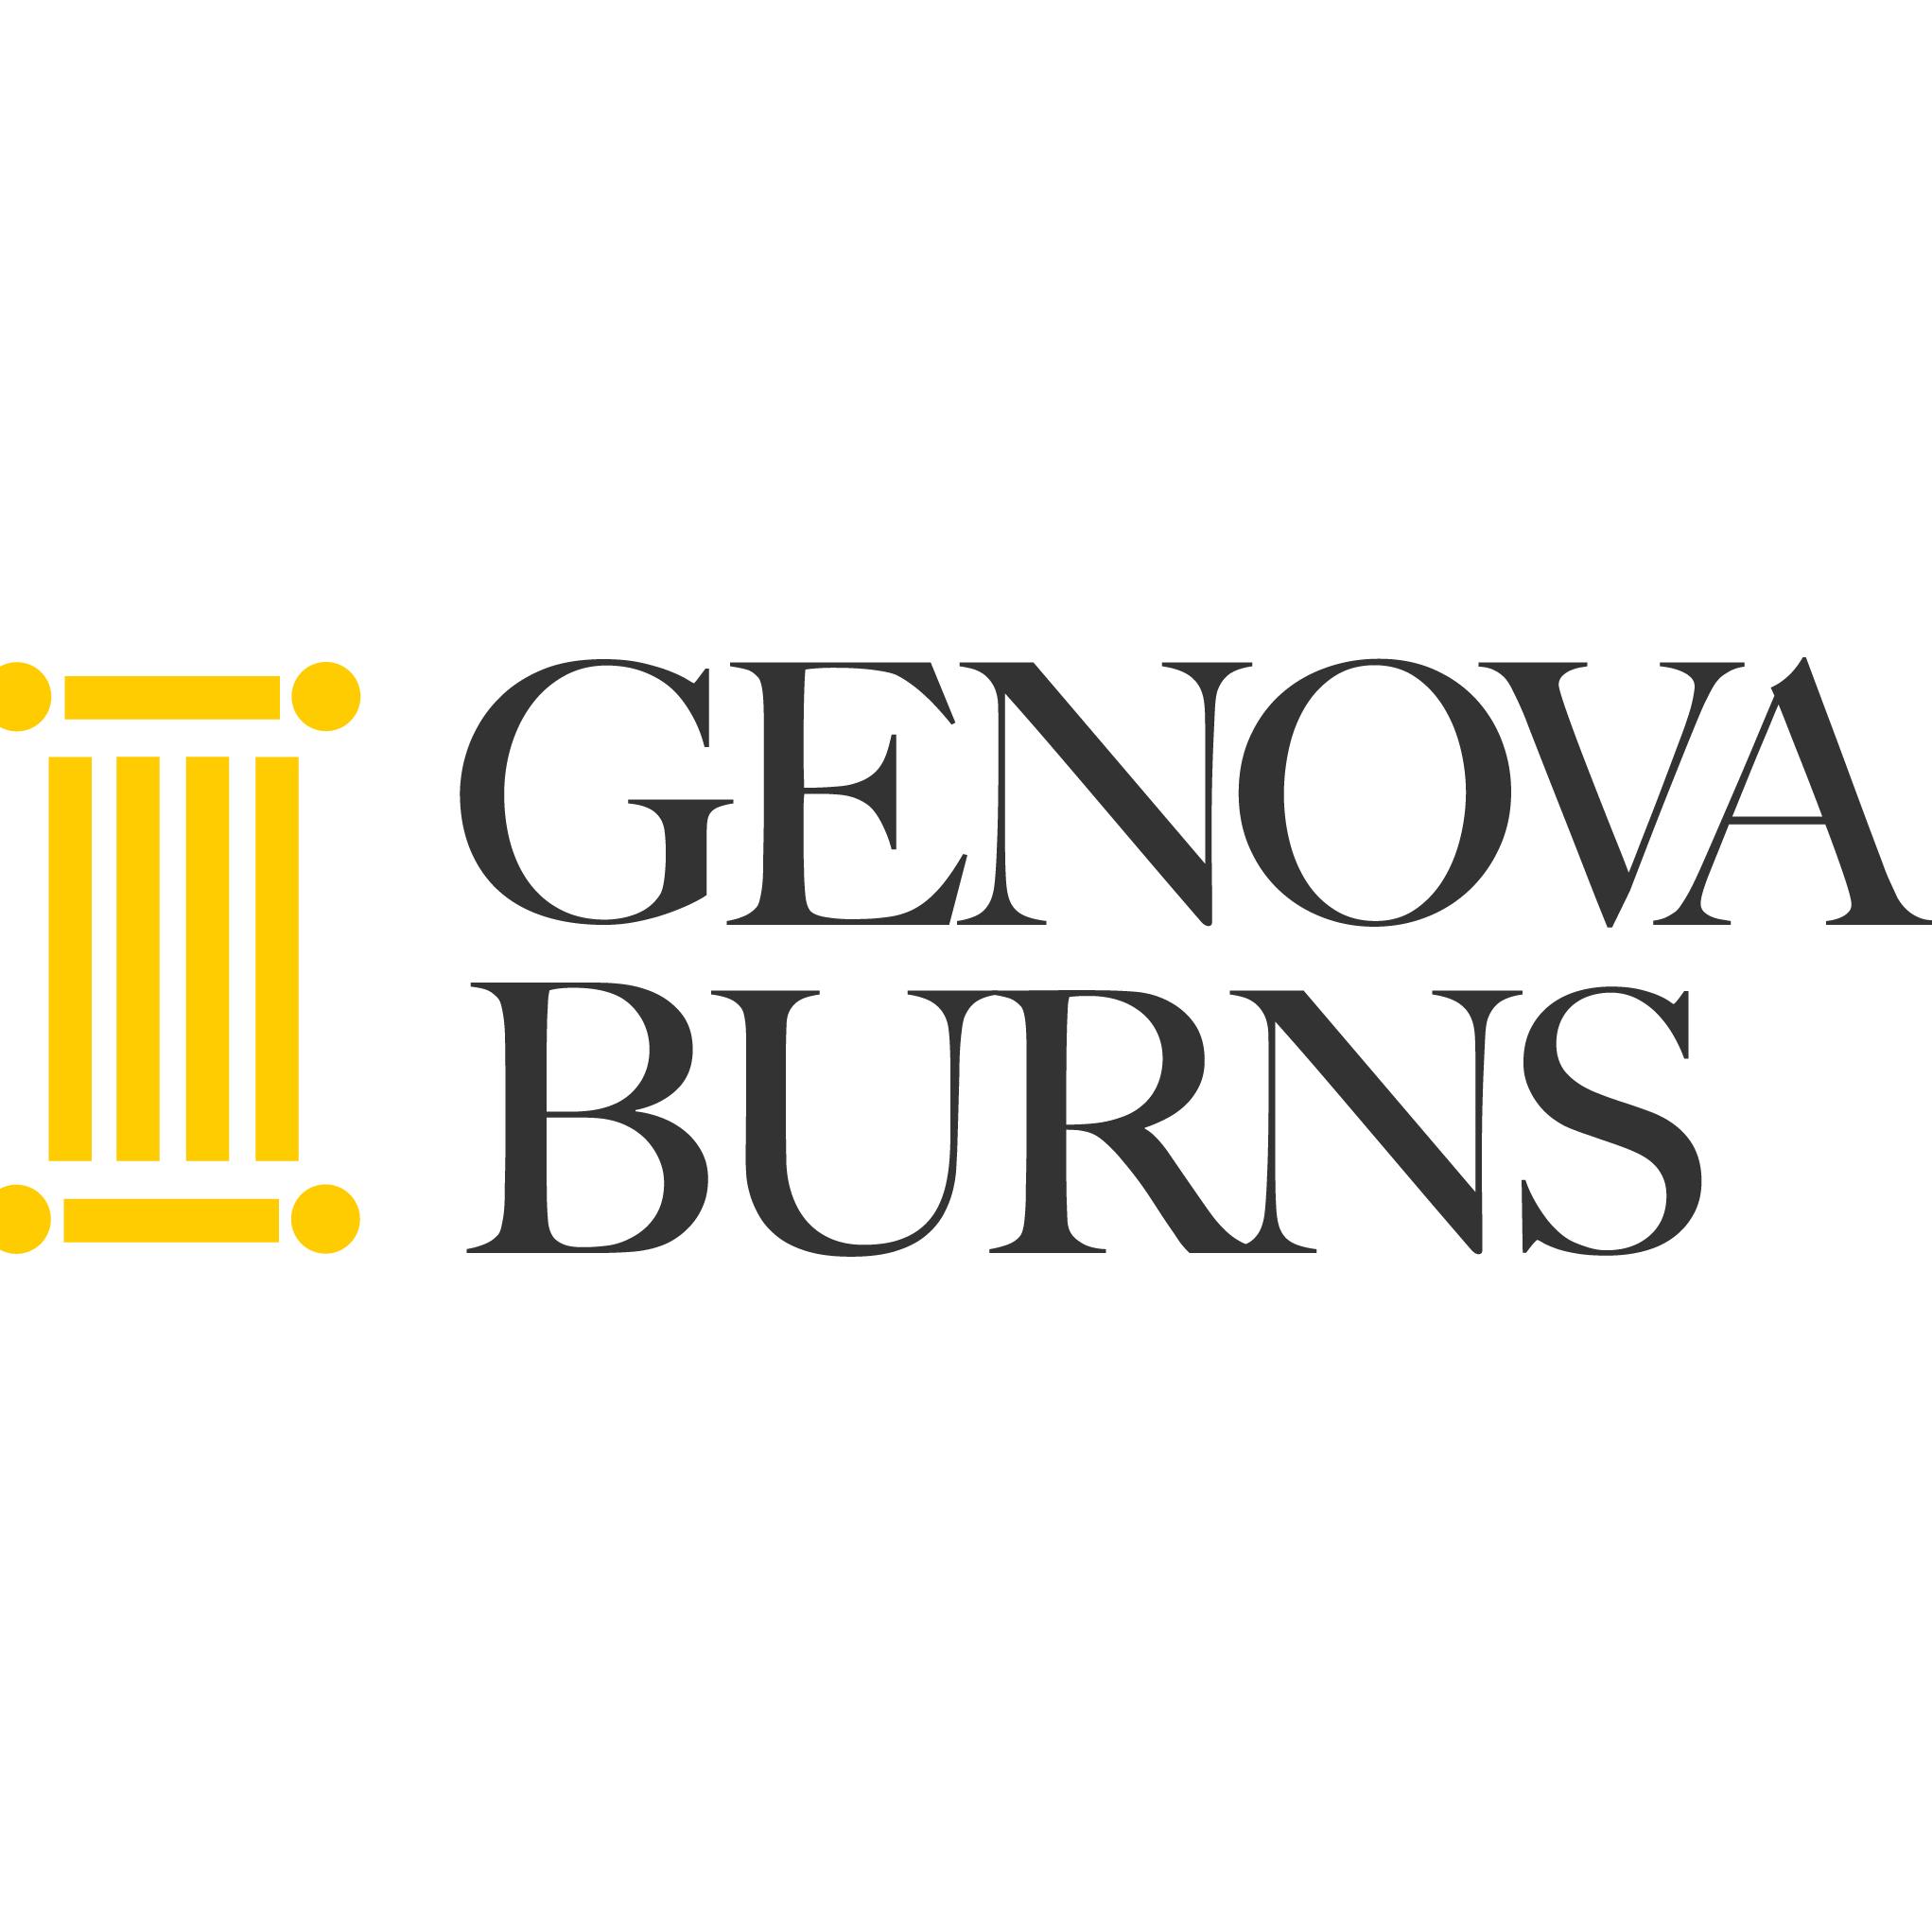 Genova Burns LLC